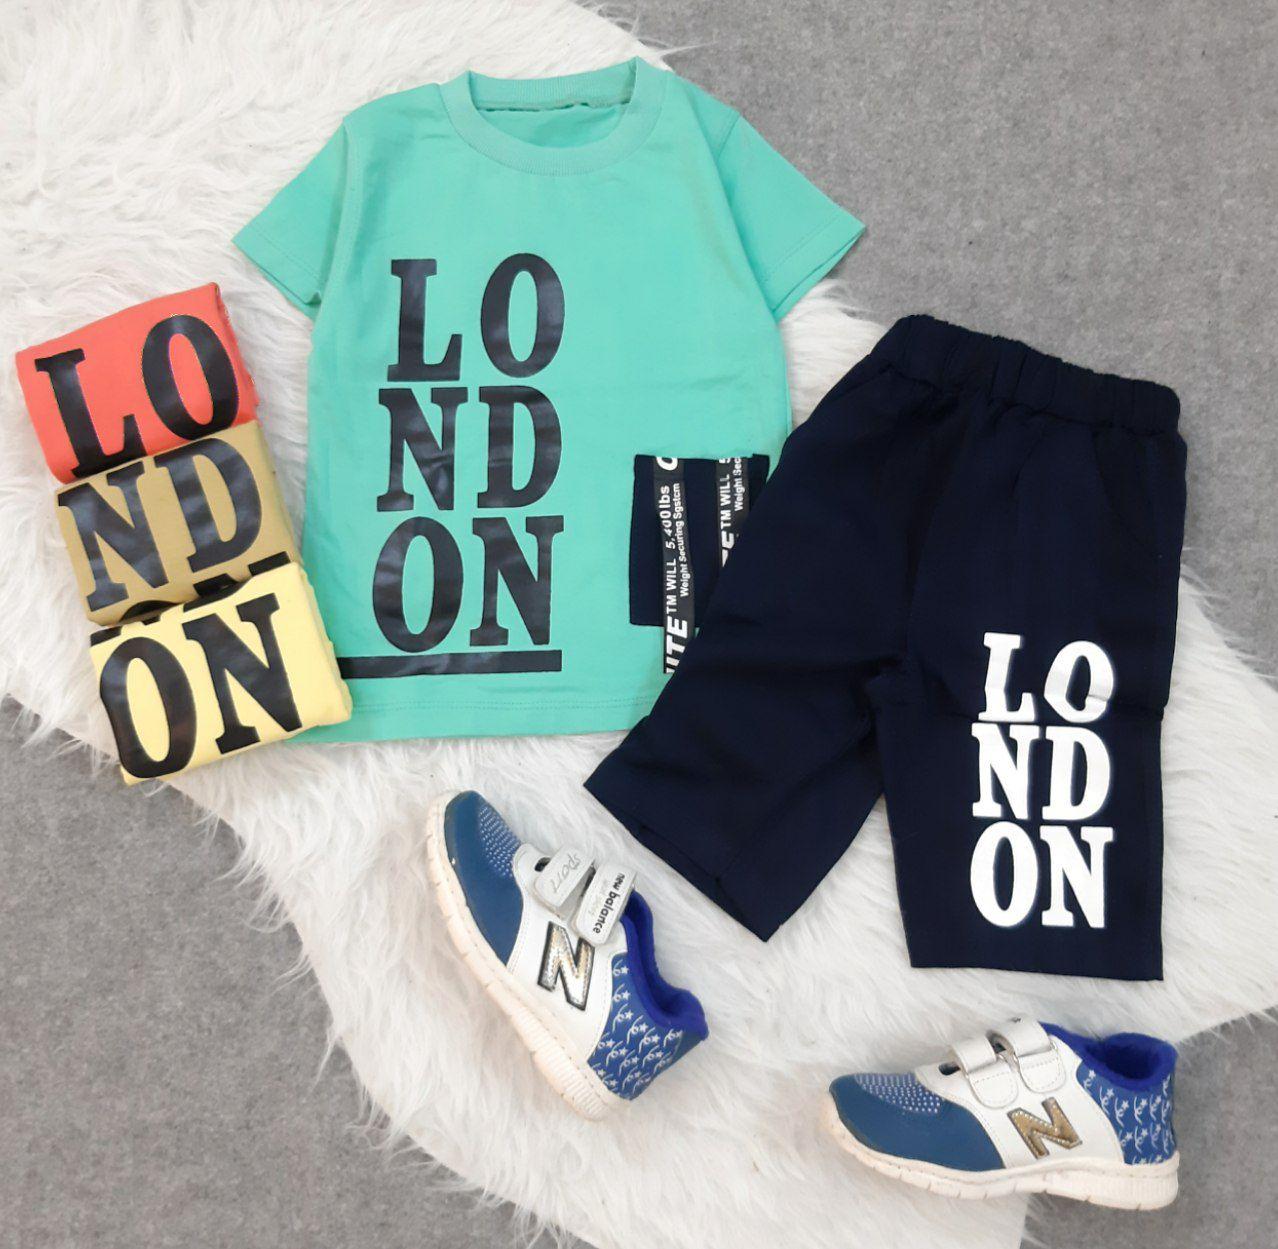 ست LONDON